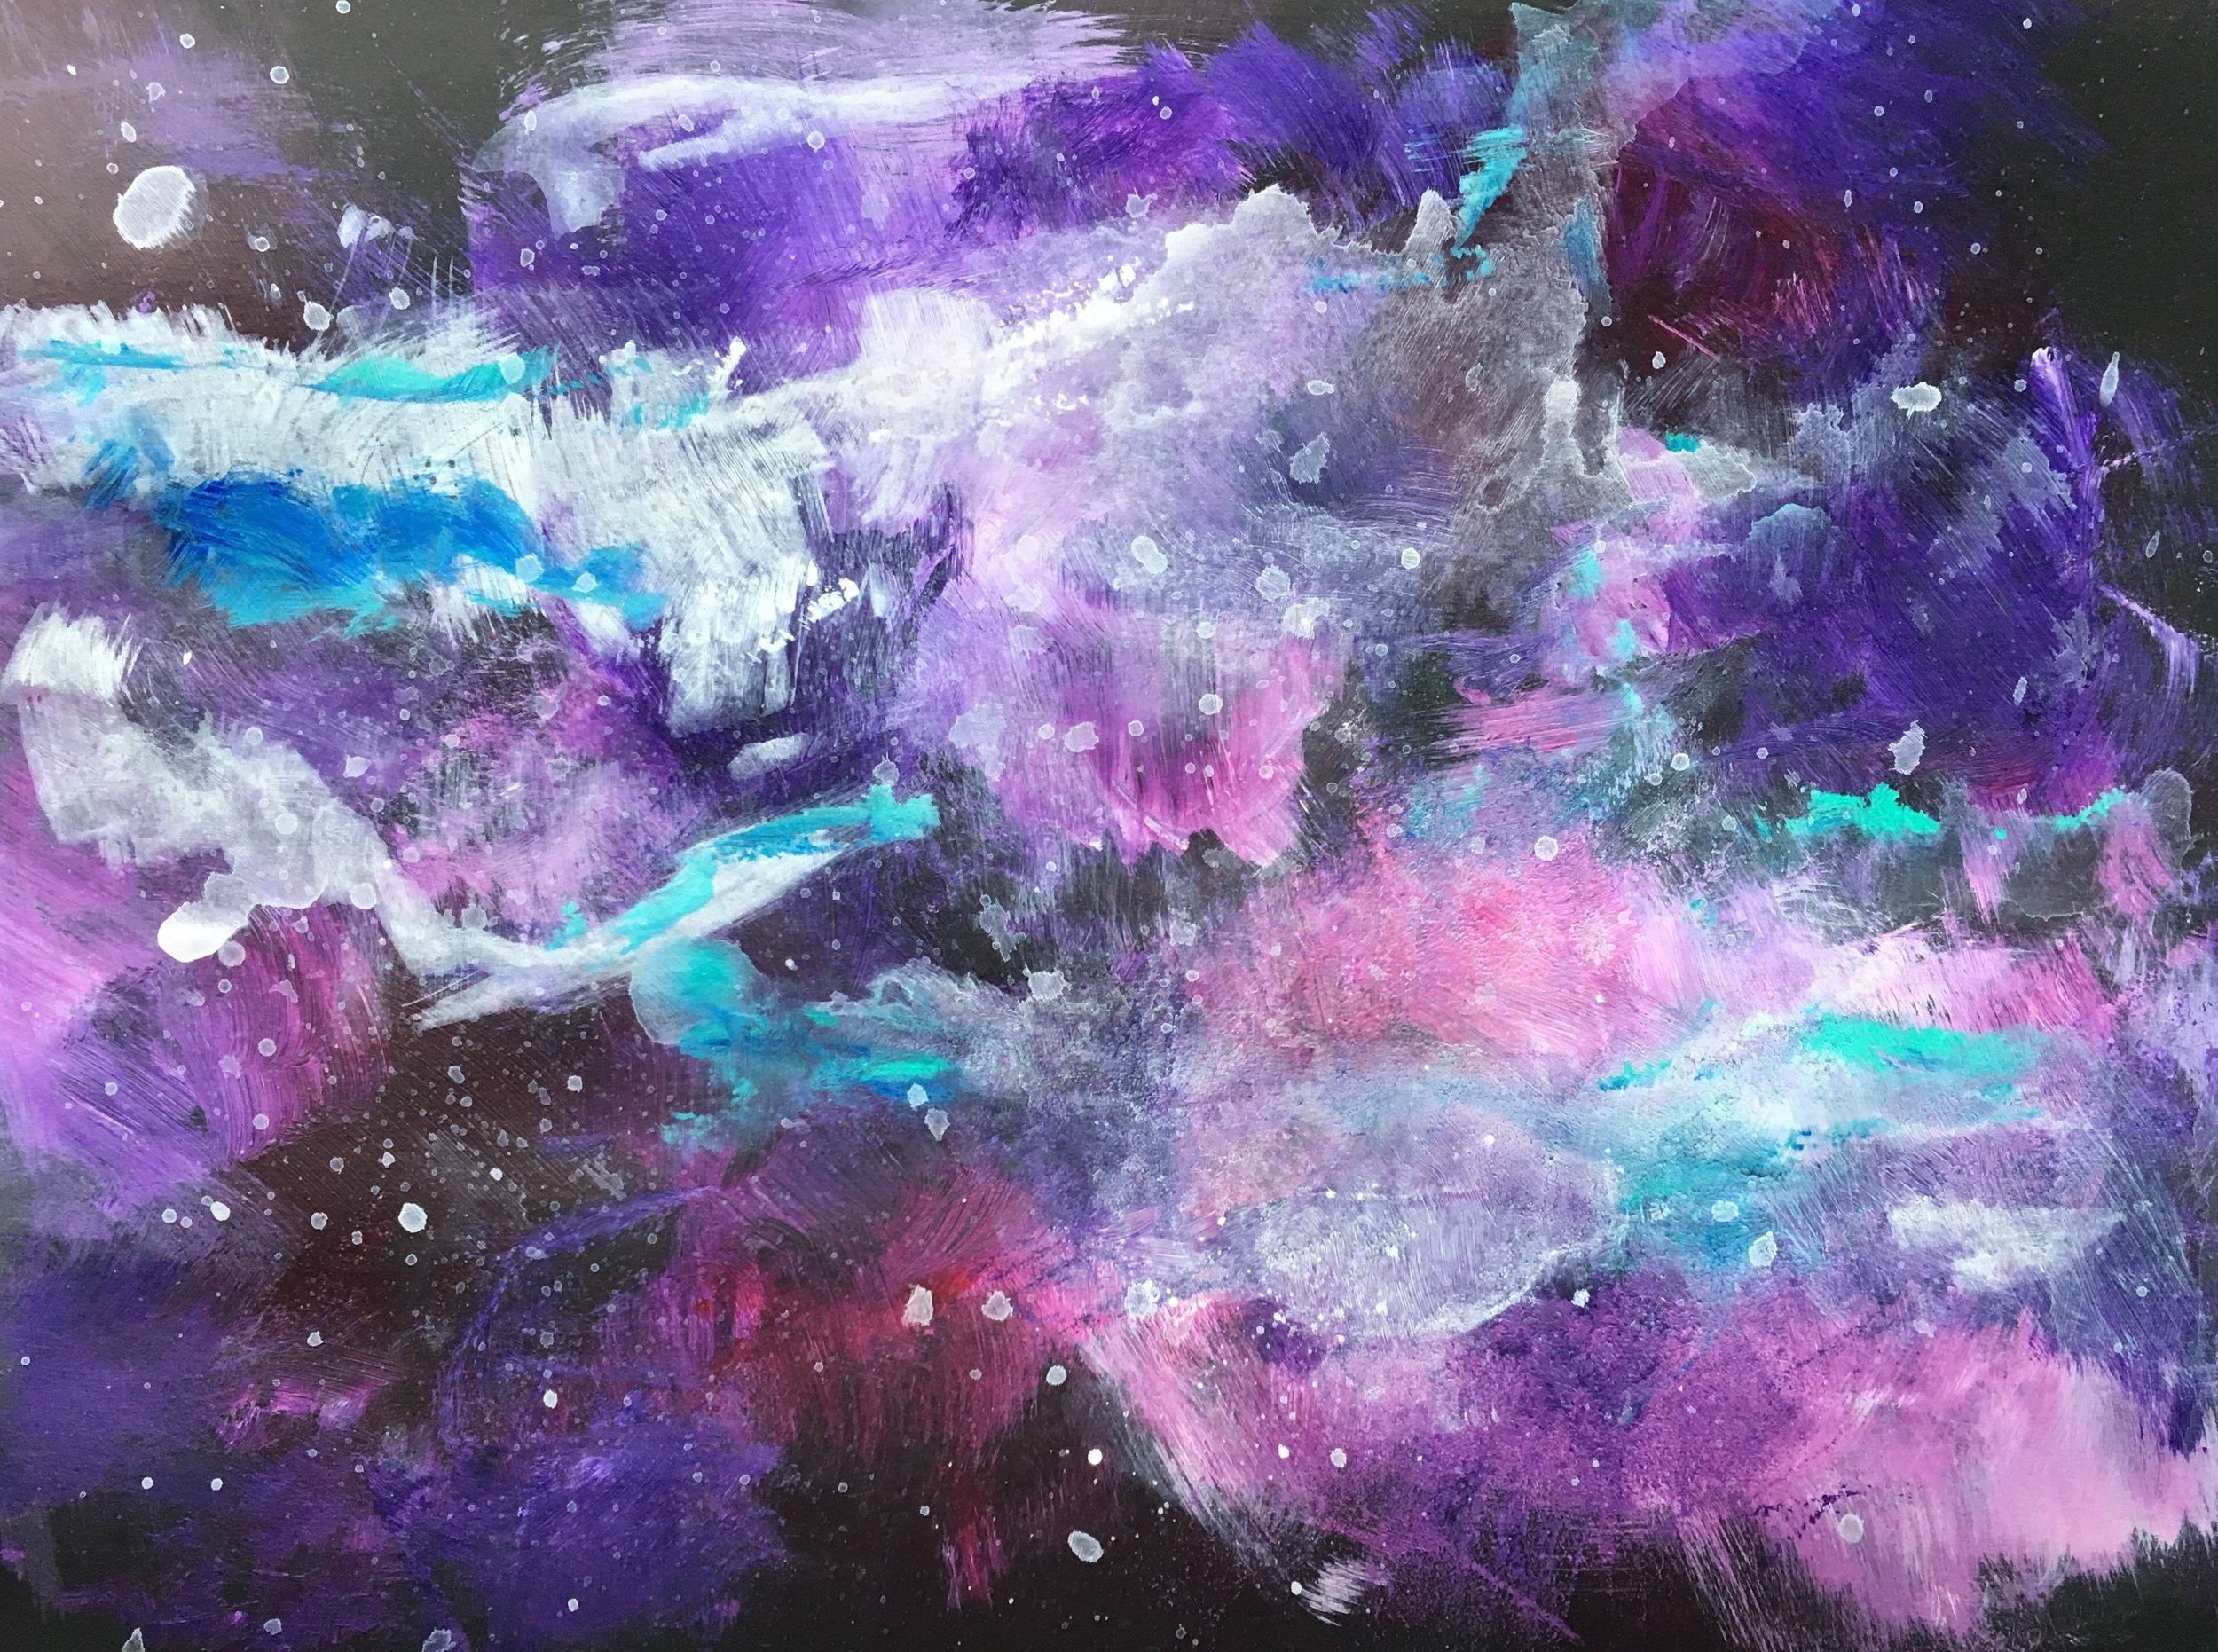 pink and purple nebula study